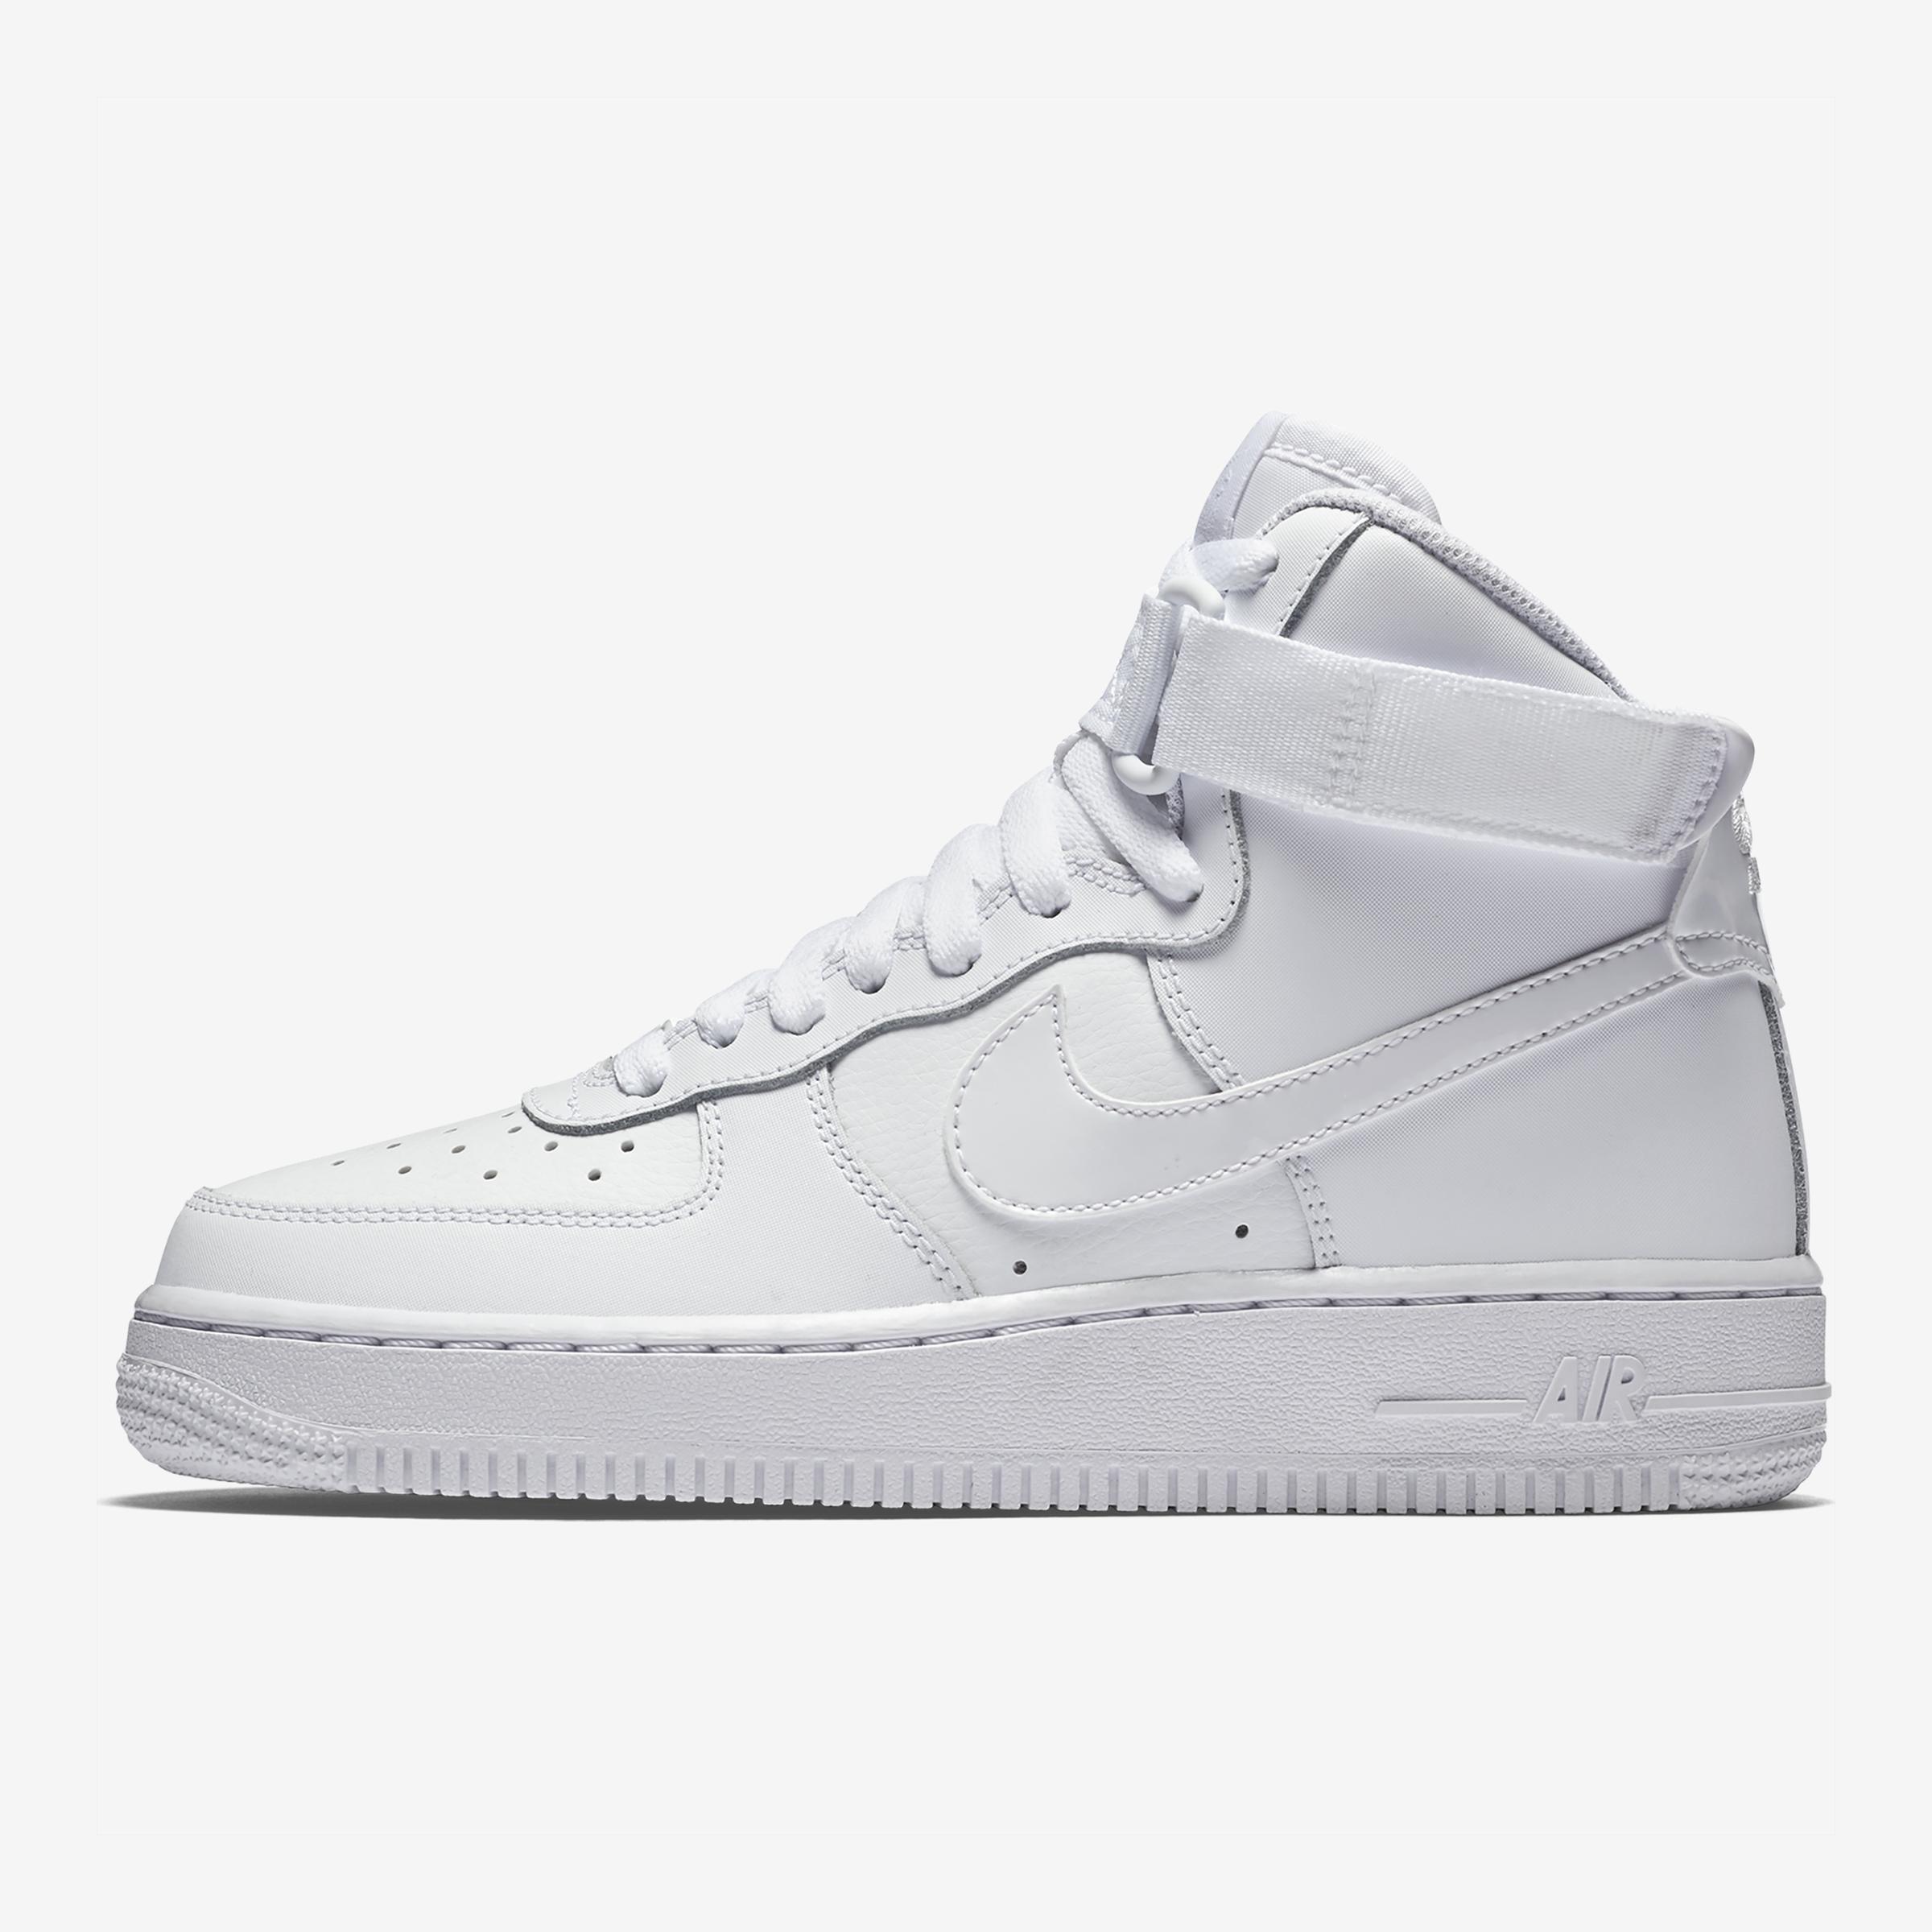 Nike Air Force 1 High Grade School Schuhe Kinder Basketball